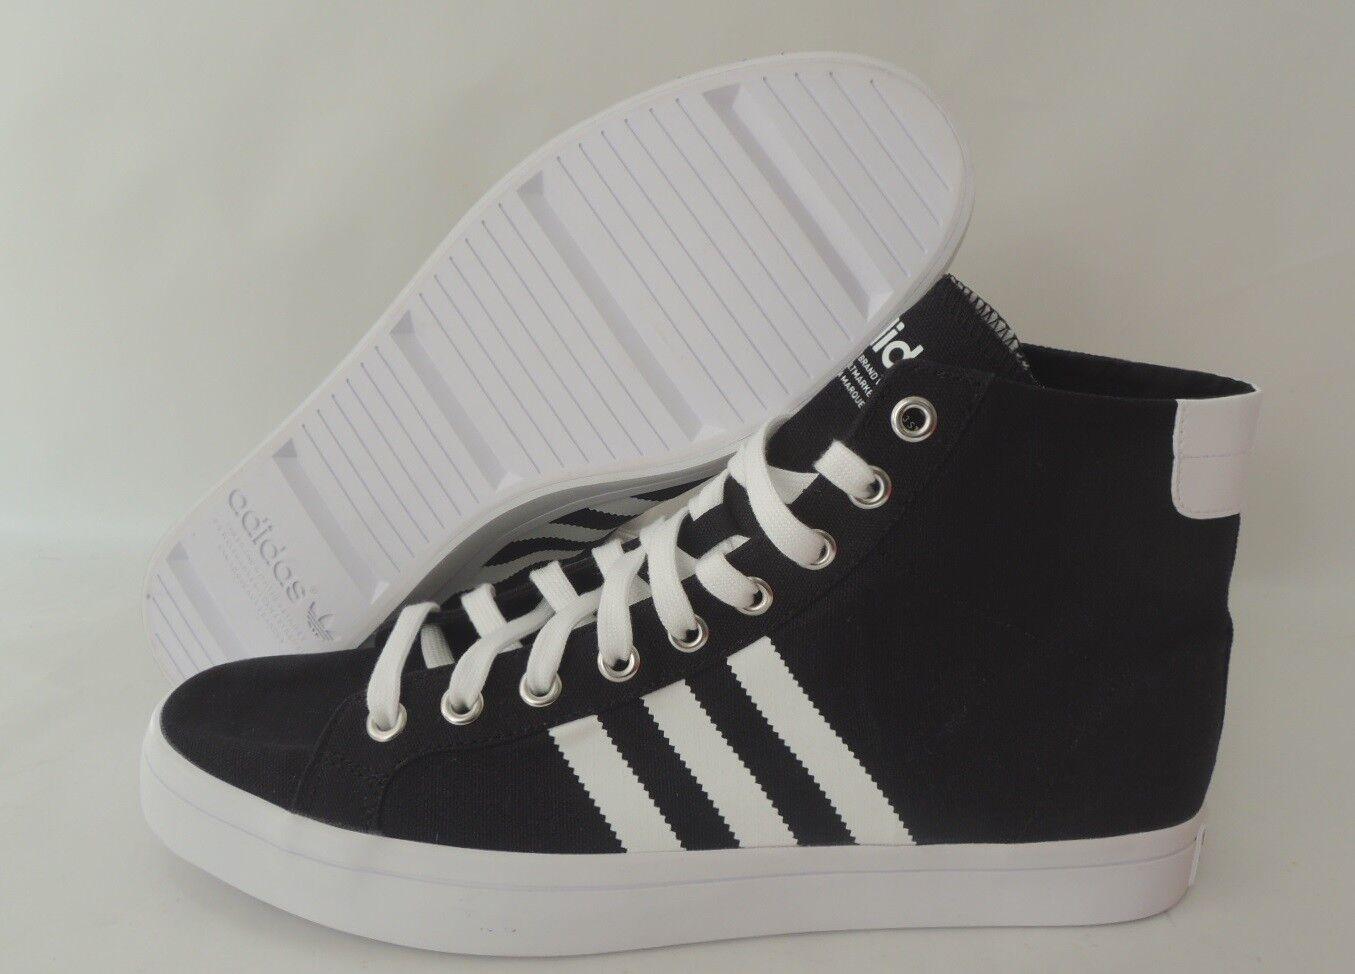 NEU adidas Court Vantage Mid M Gr. 47 1/3 Schuhe Sneaker Boots ORIGINBLS S79303